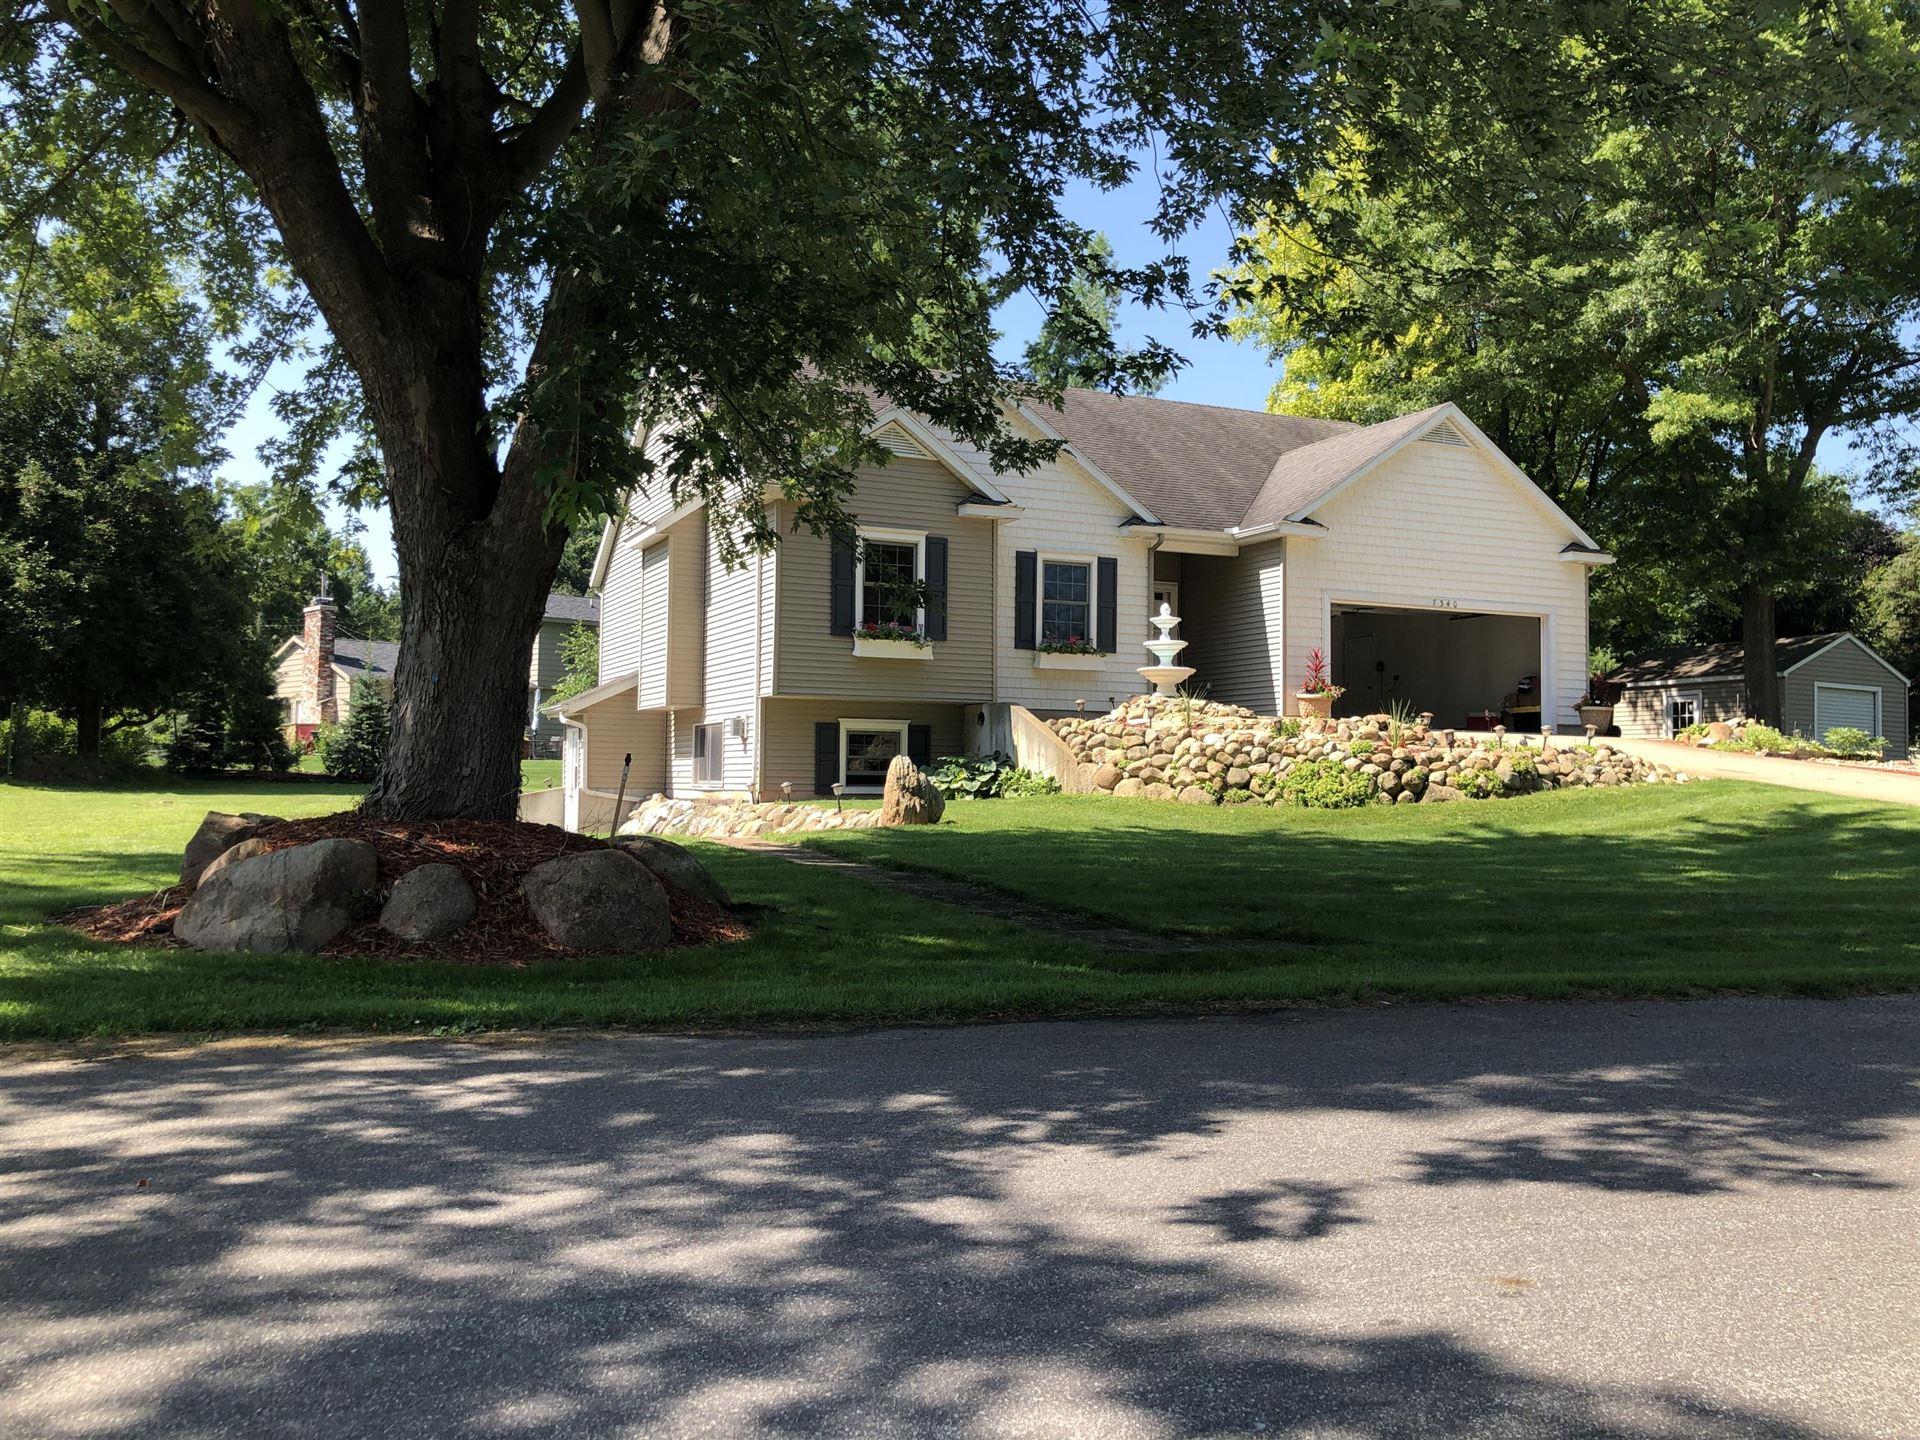 7340 Grachen Drive SE, Grand Rapids, MI 49546 - MLS#: 21100097